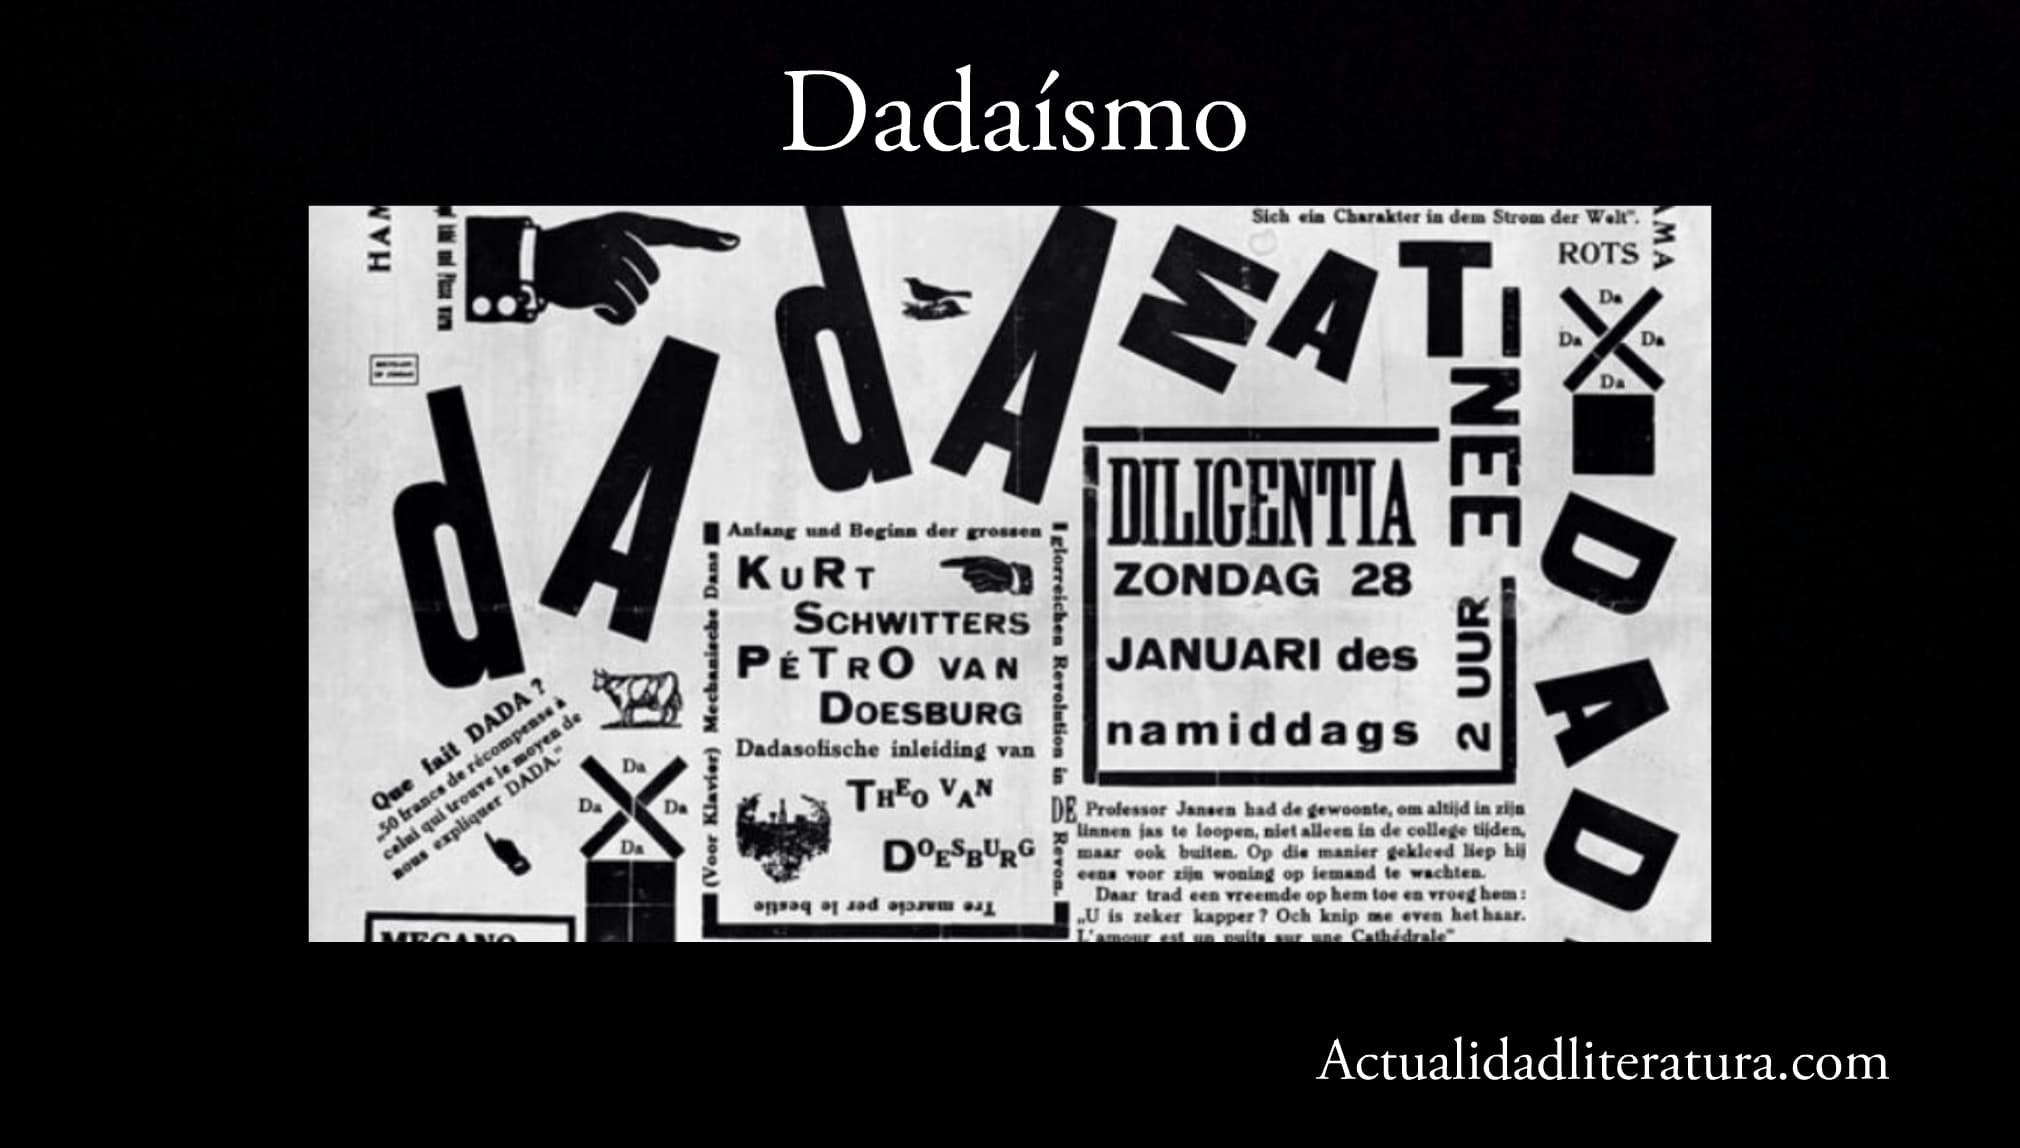 Dadaísmo.